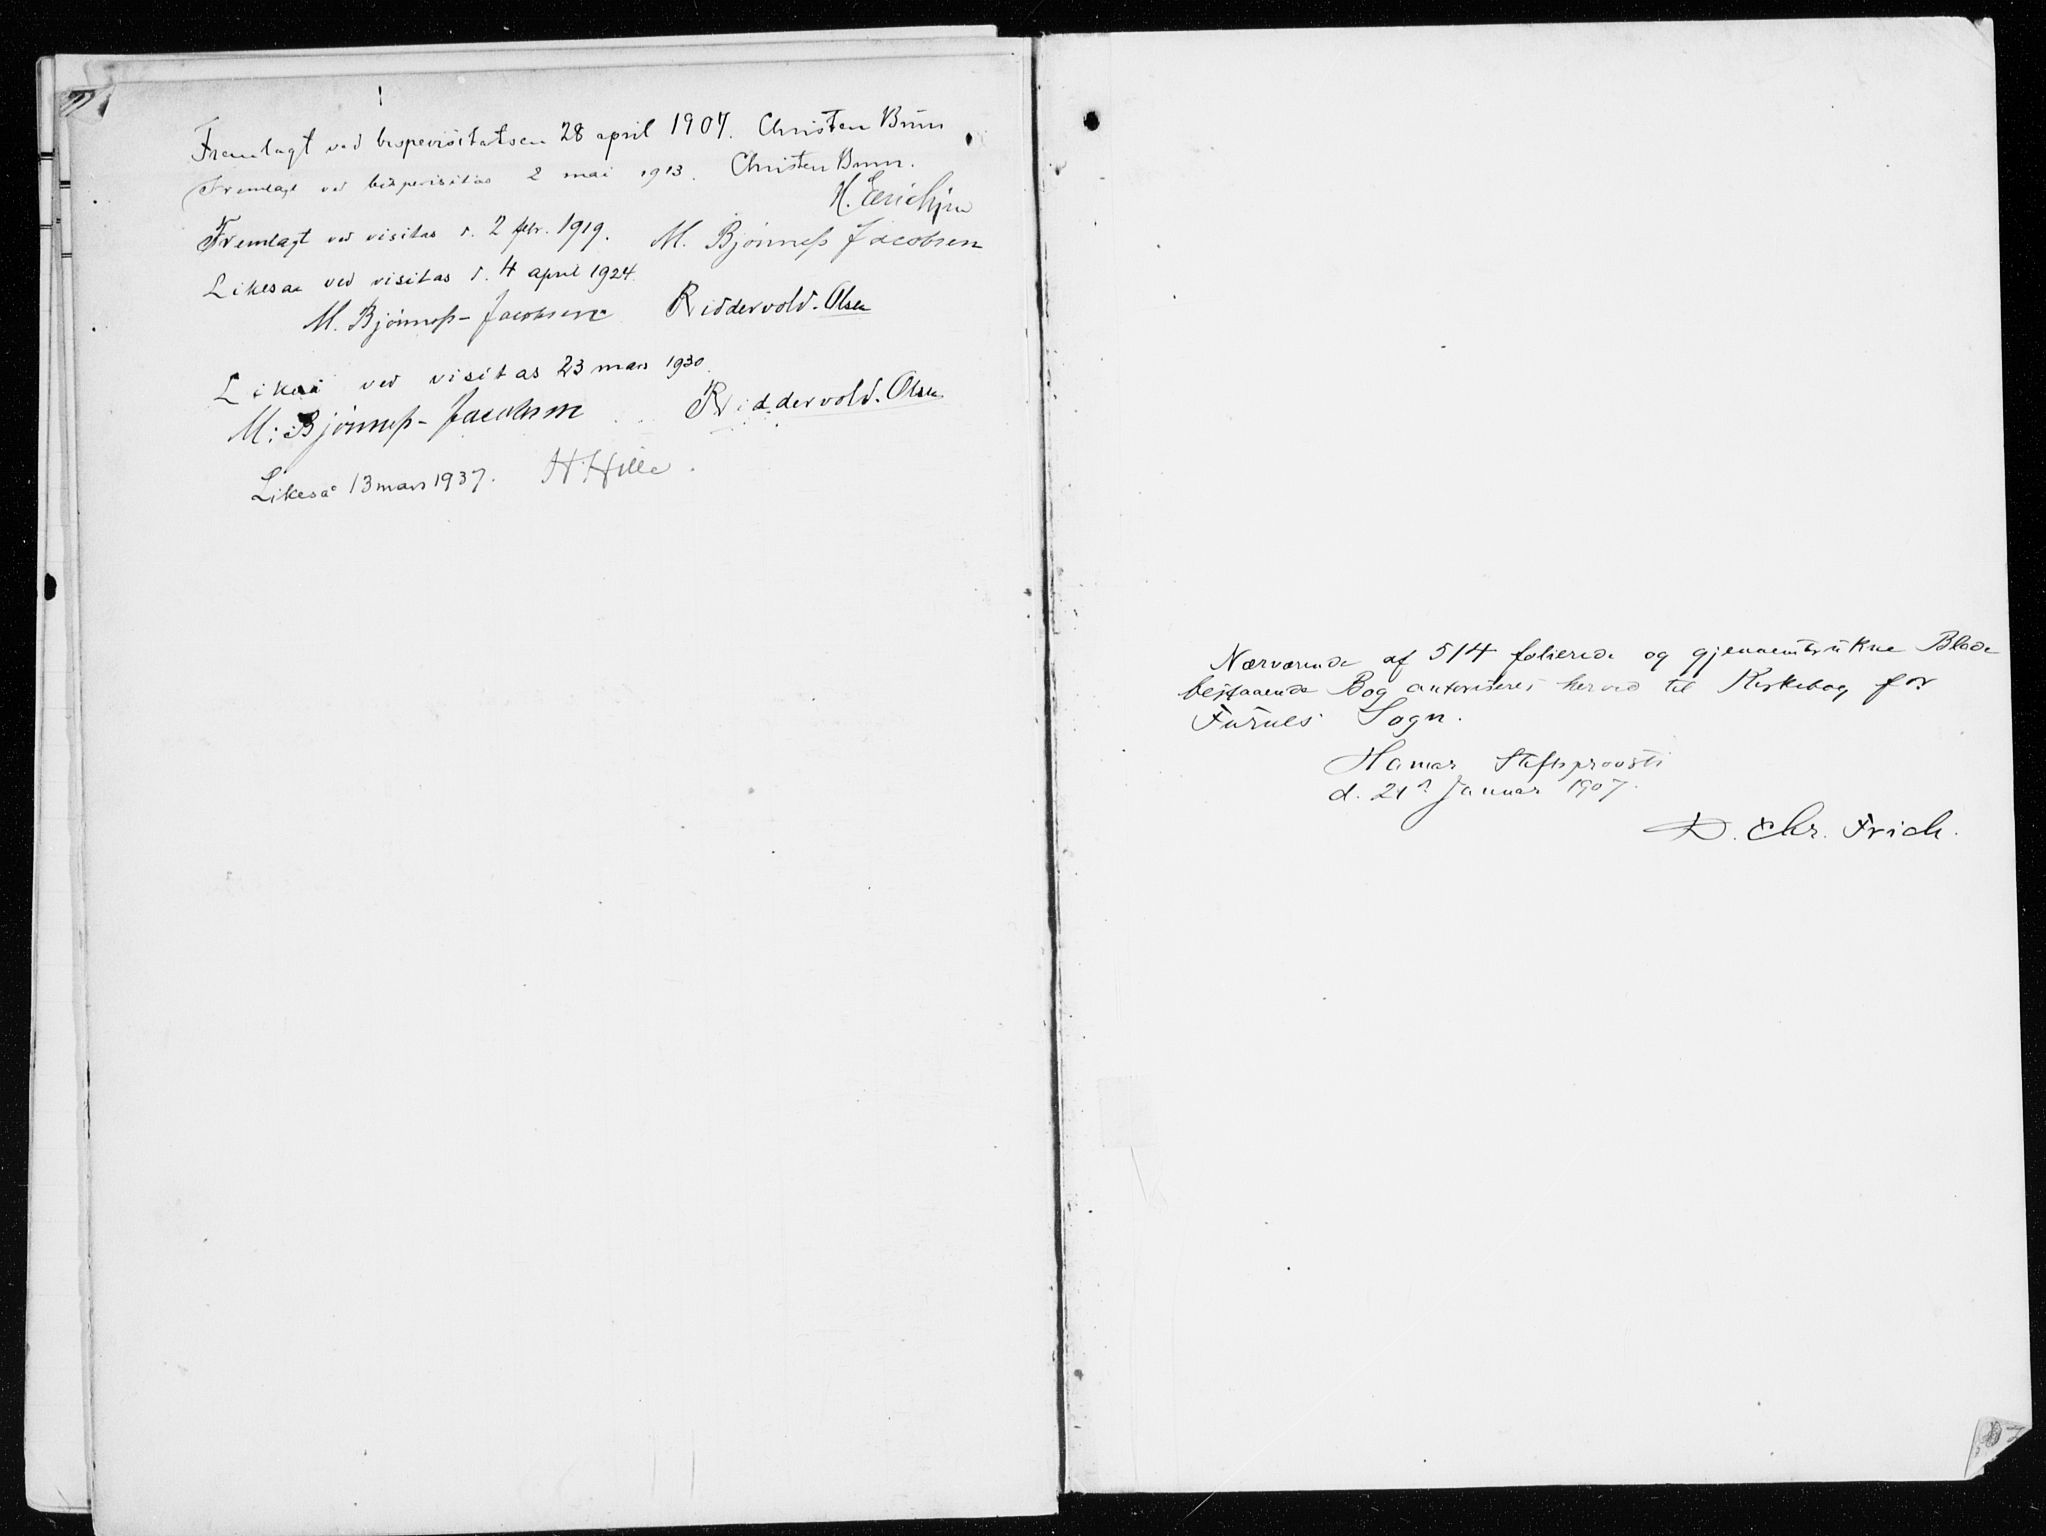 SAH, Furnes prestekontor, K/Ka/L0001: Ministerialbok nr. 1, 1907-1935